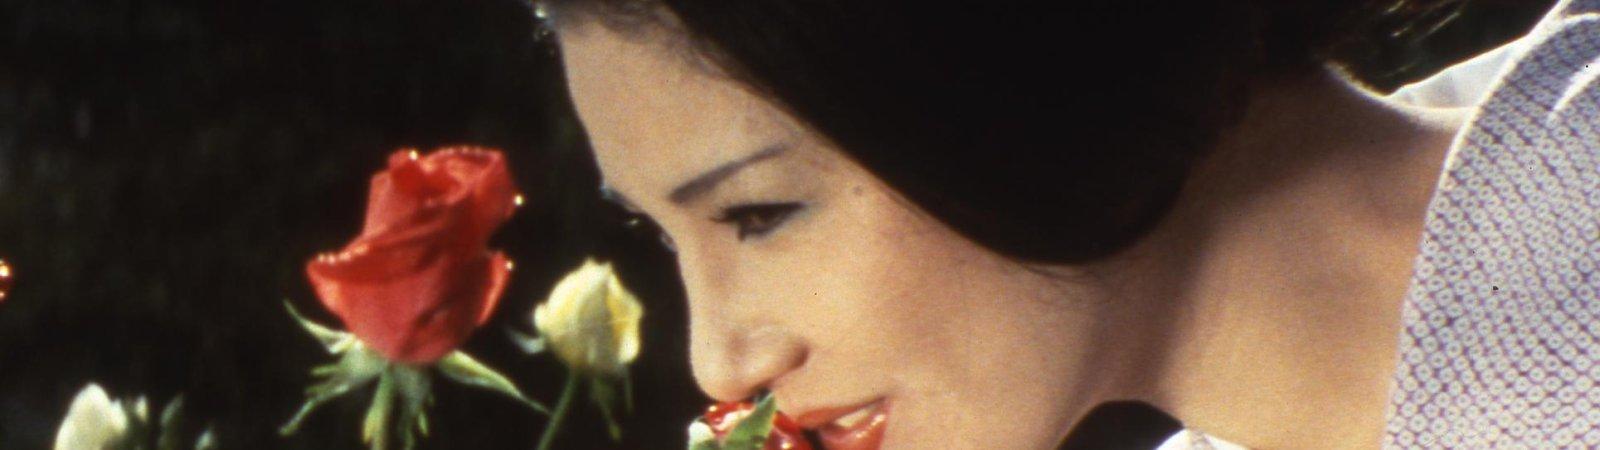 Photo dernier film Masaru Konuma